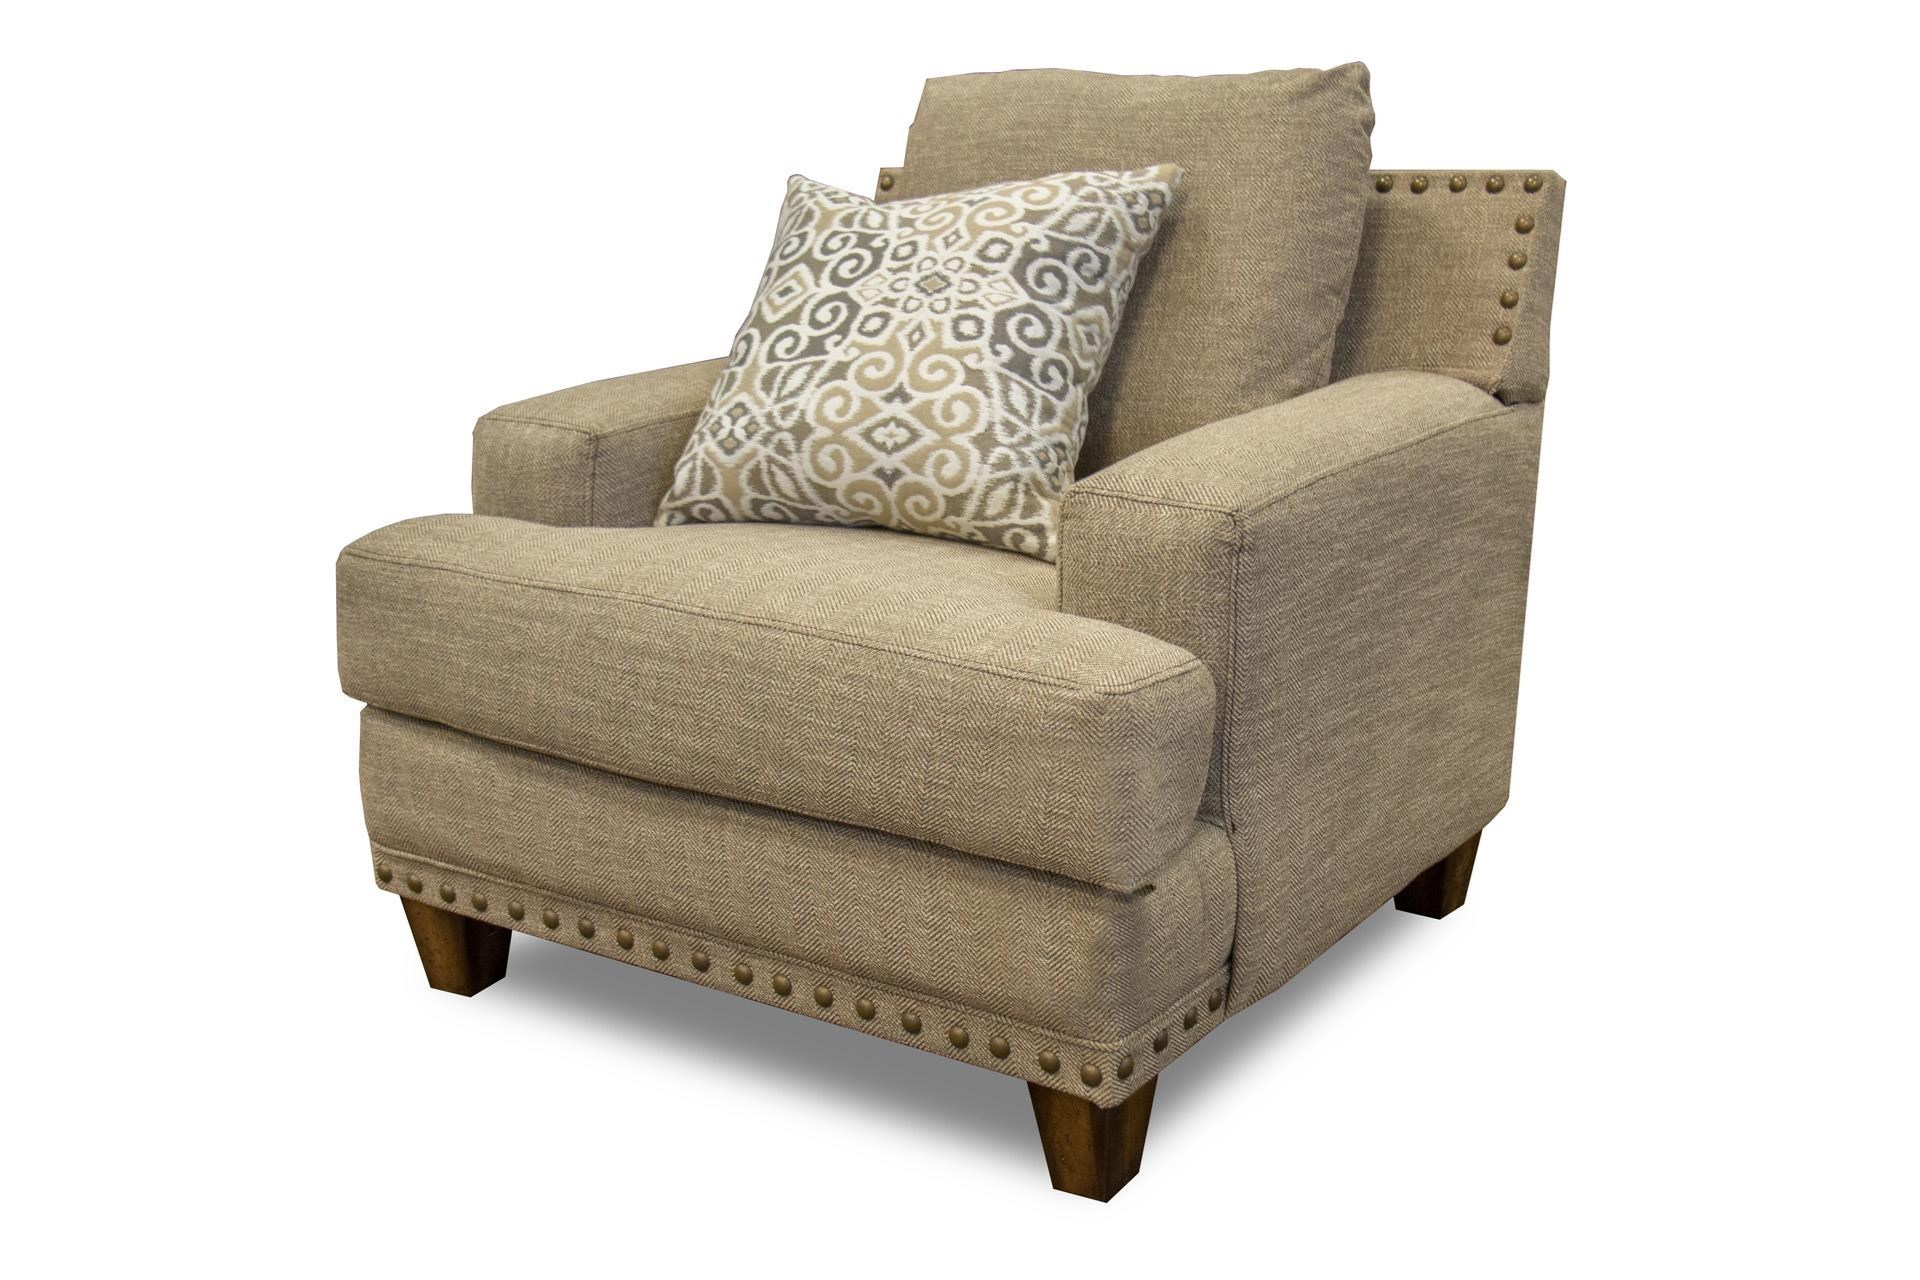 Franklin Hobbs Chair U0026 A Half   Great American Home Store   Chair U0026 A Half